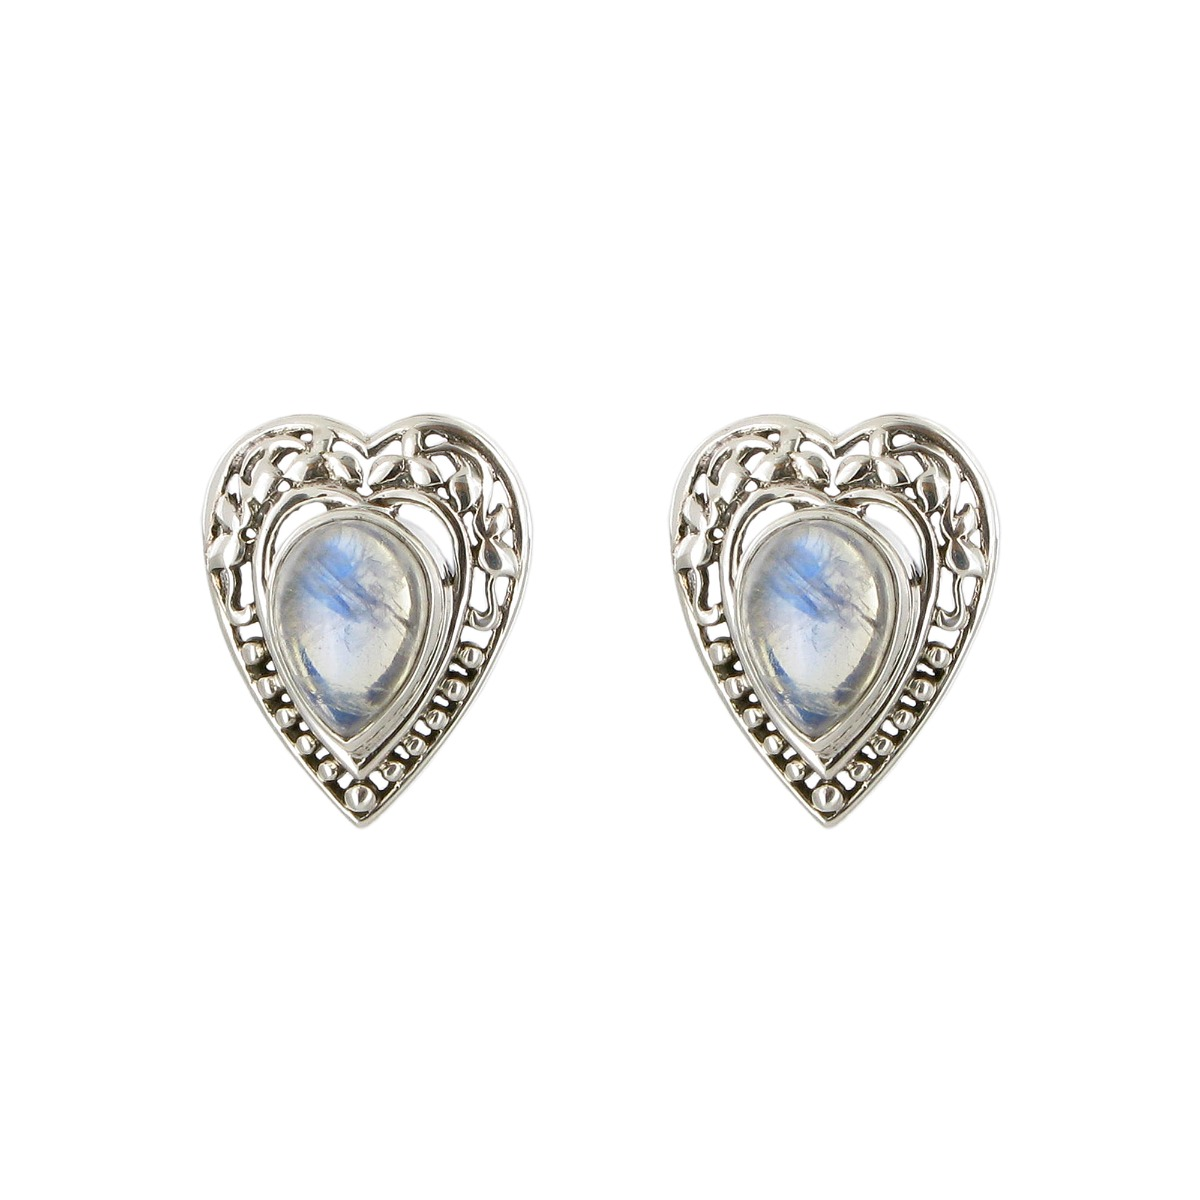 Heart moonstone stud earrings